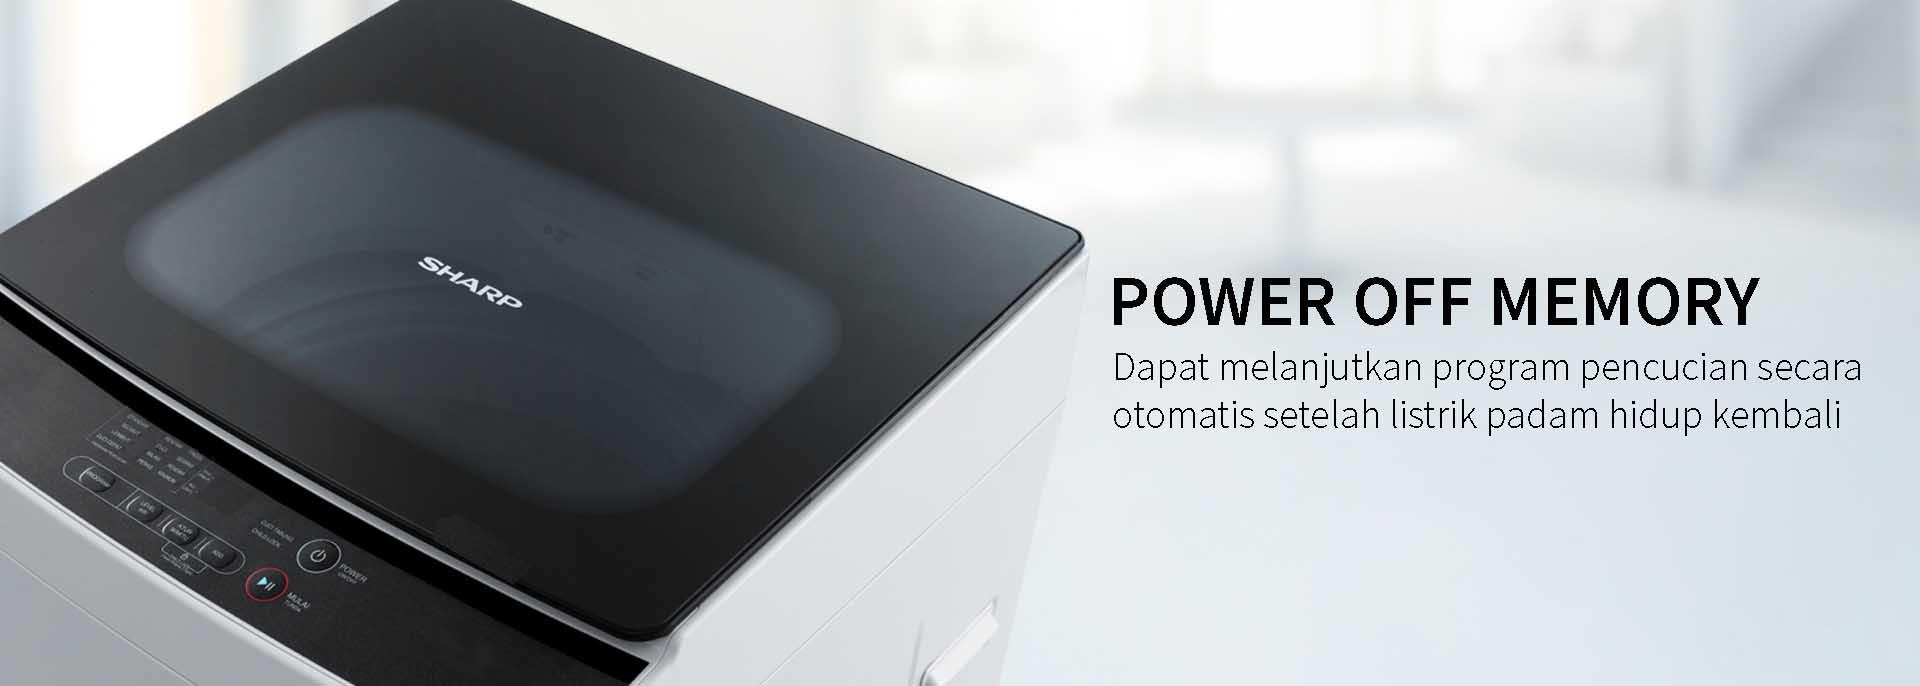 poweroff_0.jpg